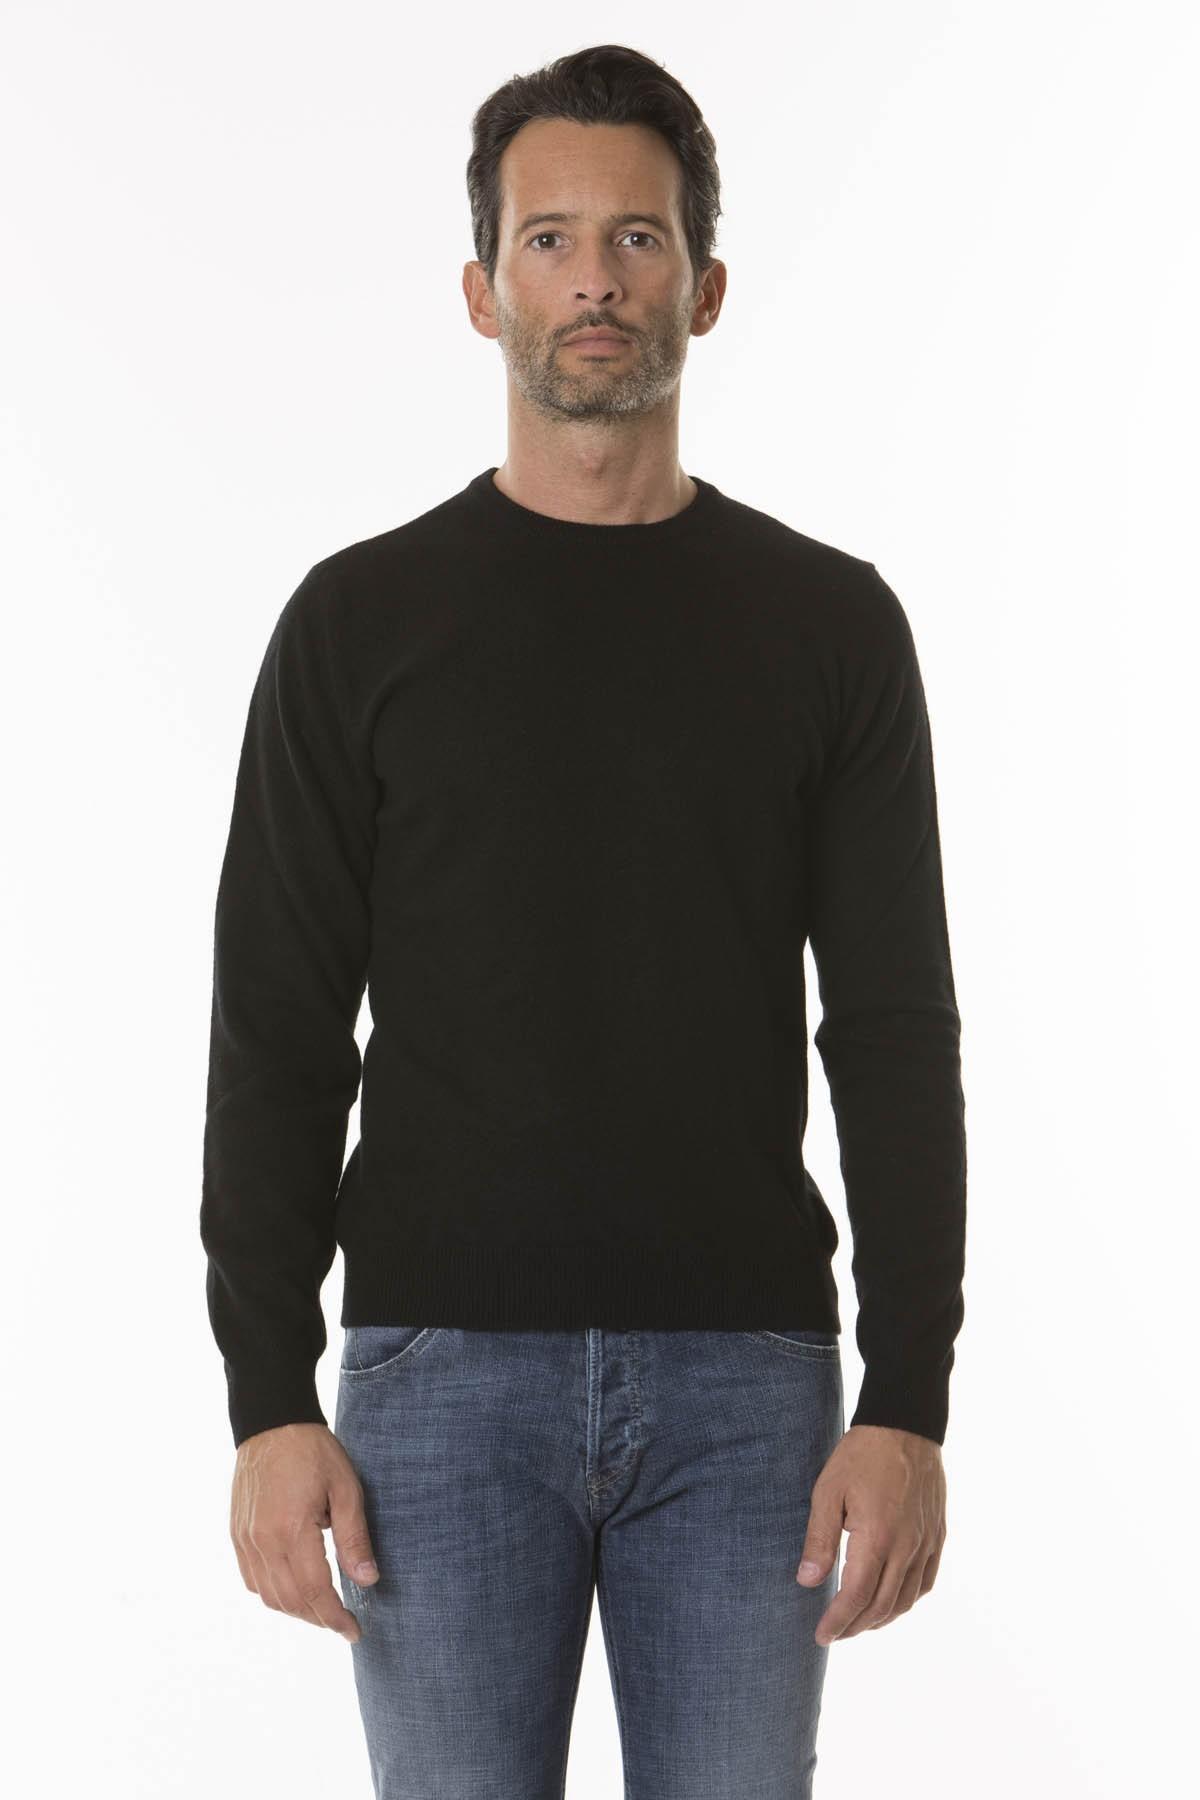 Pullover Cashmere per uomo RIONE FONTANA A/I 18-19